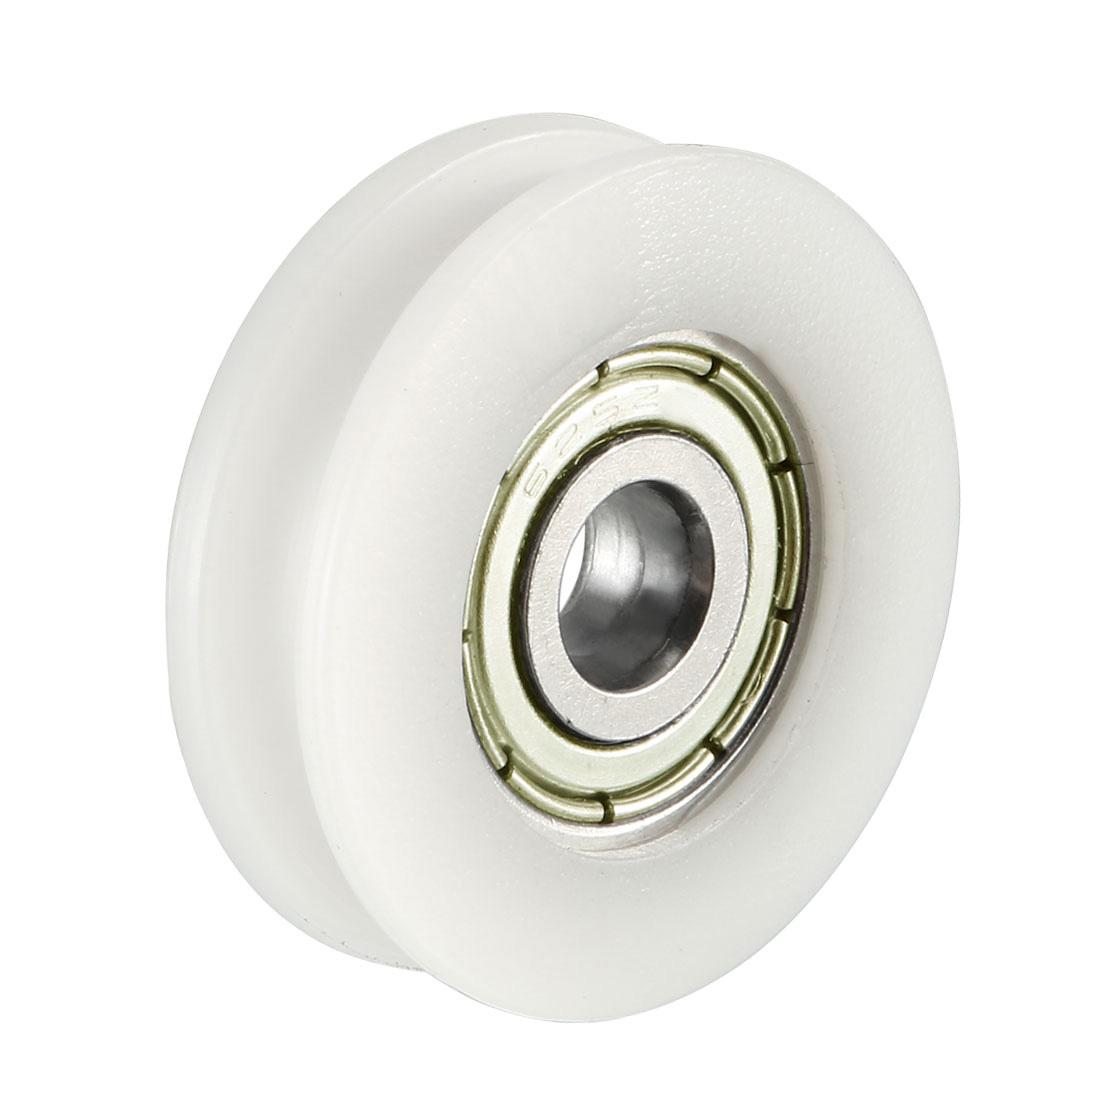 V Groove Guide Bearing Pulley Rail Ball Wheel White 5x24x7mm 2pcs